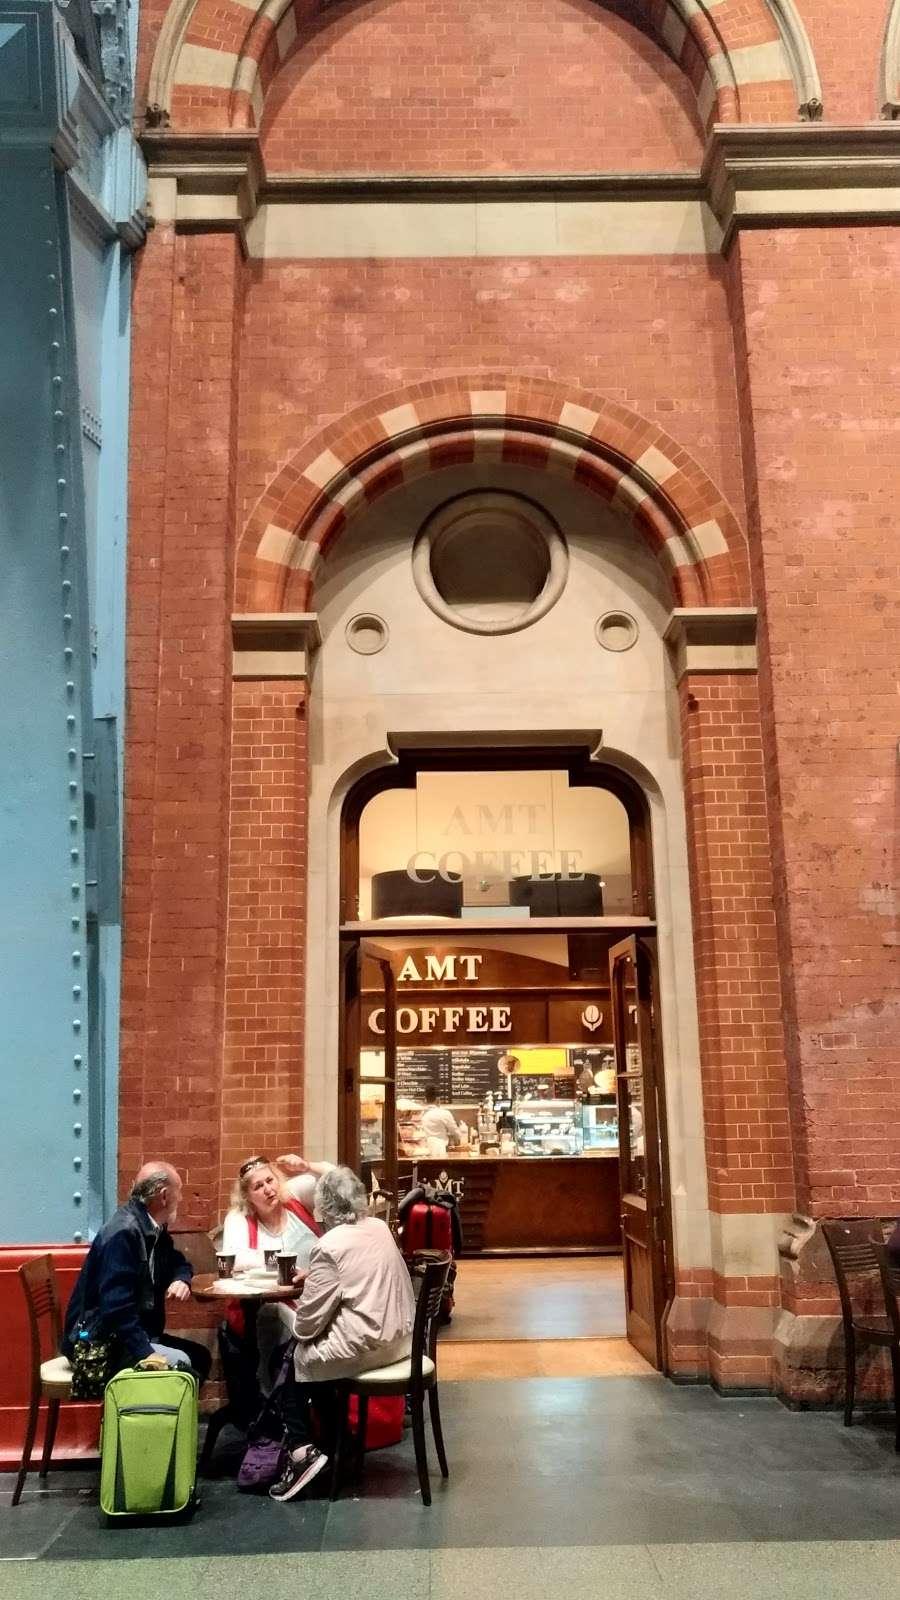 AMT Coffee - cafe  | Photo 2 of 10 | Address: Euston Rd, Kings Cross, London N1C 4QP, UK | Phone: 020 3772 4000